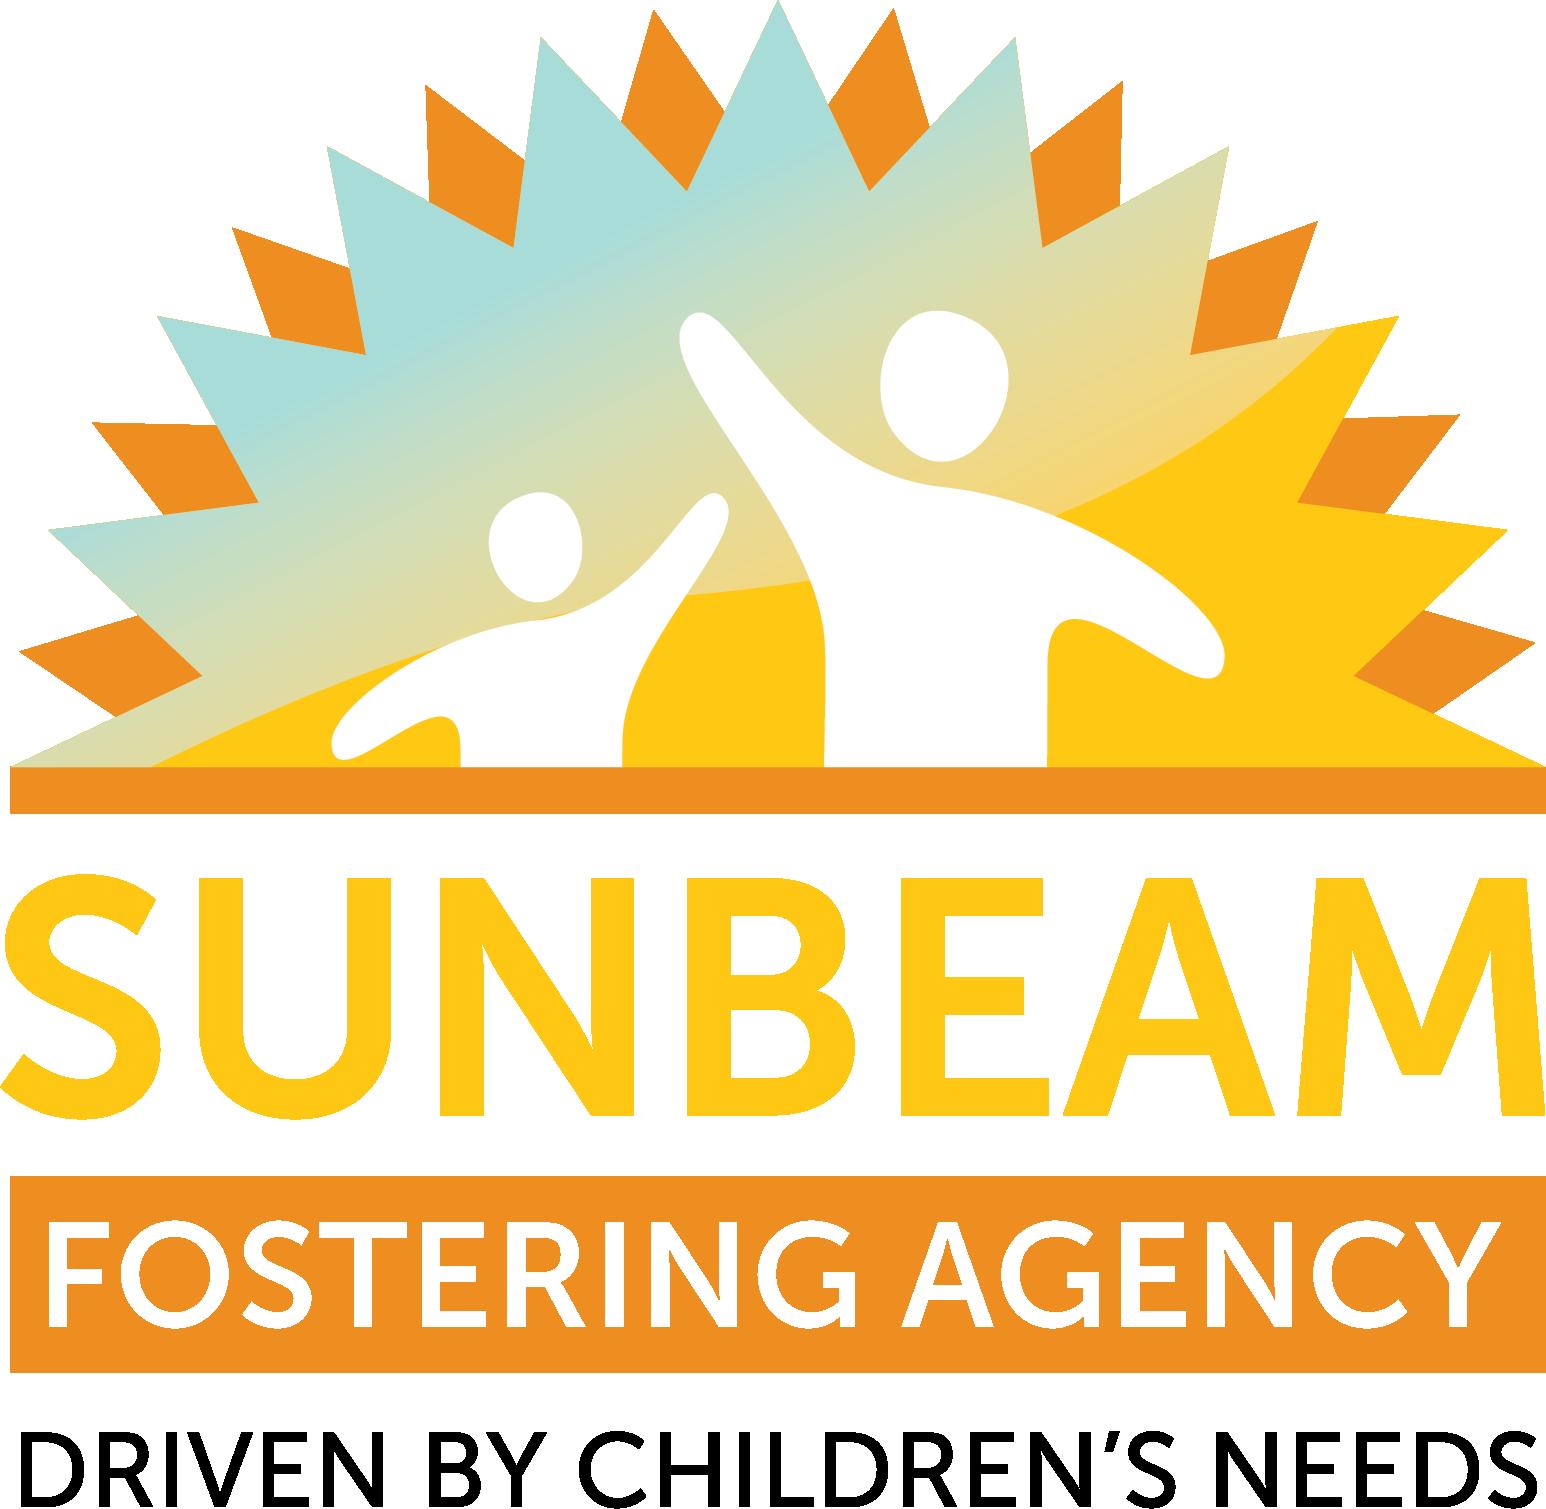 SUNBEAM FOSTERING AGENCY's logo